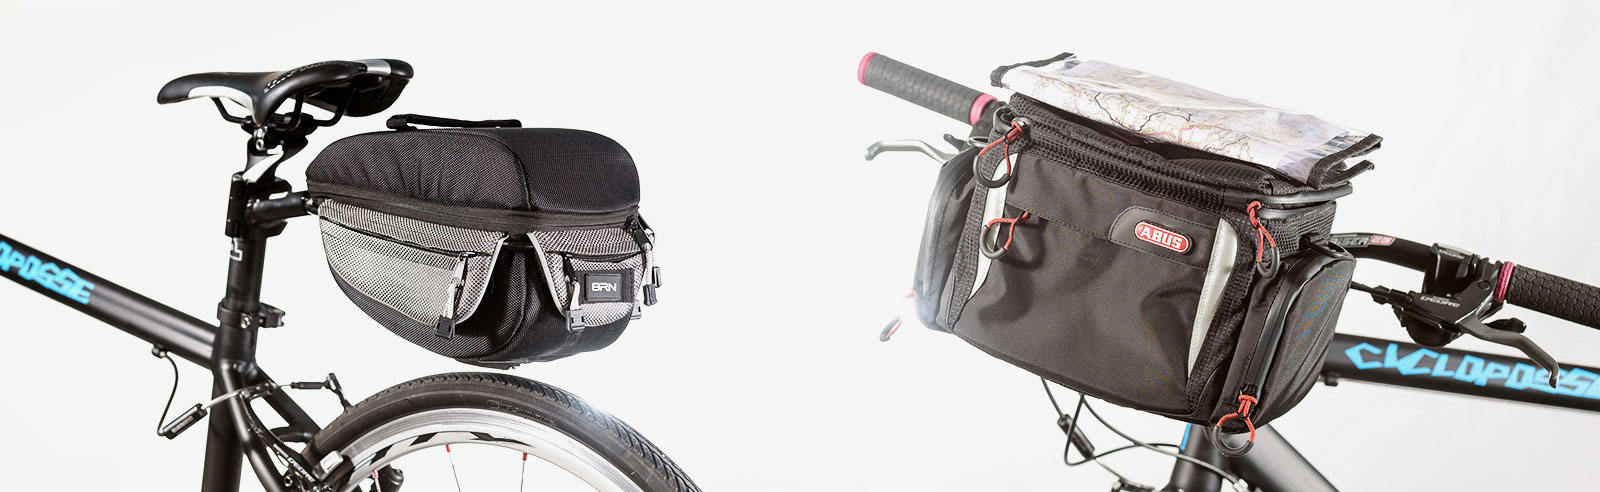 bags bike tours Bikes & Equipment